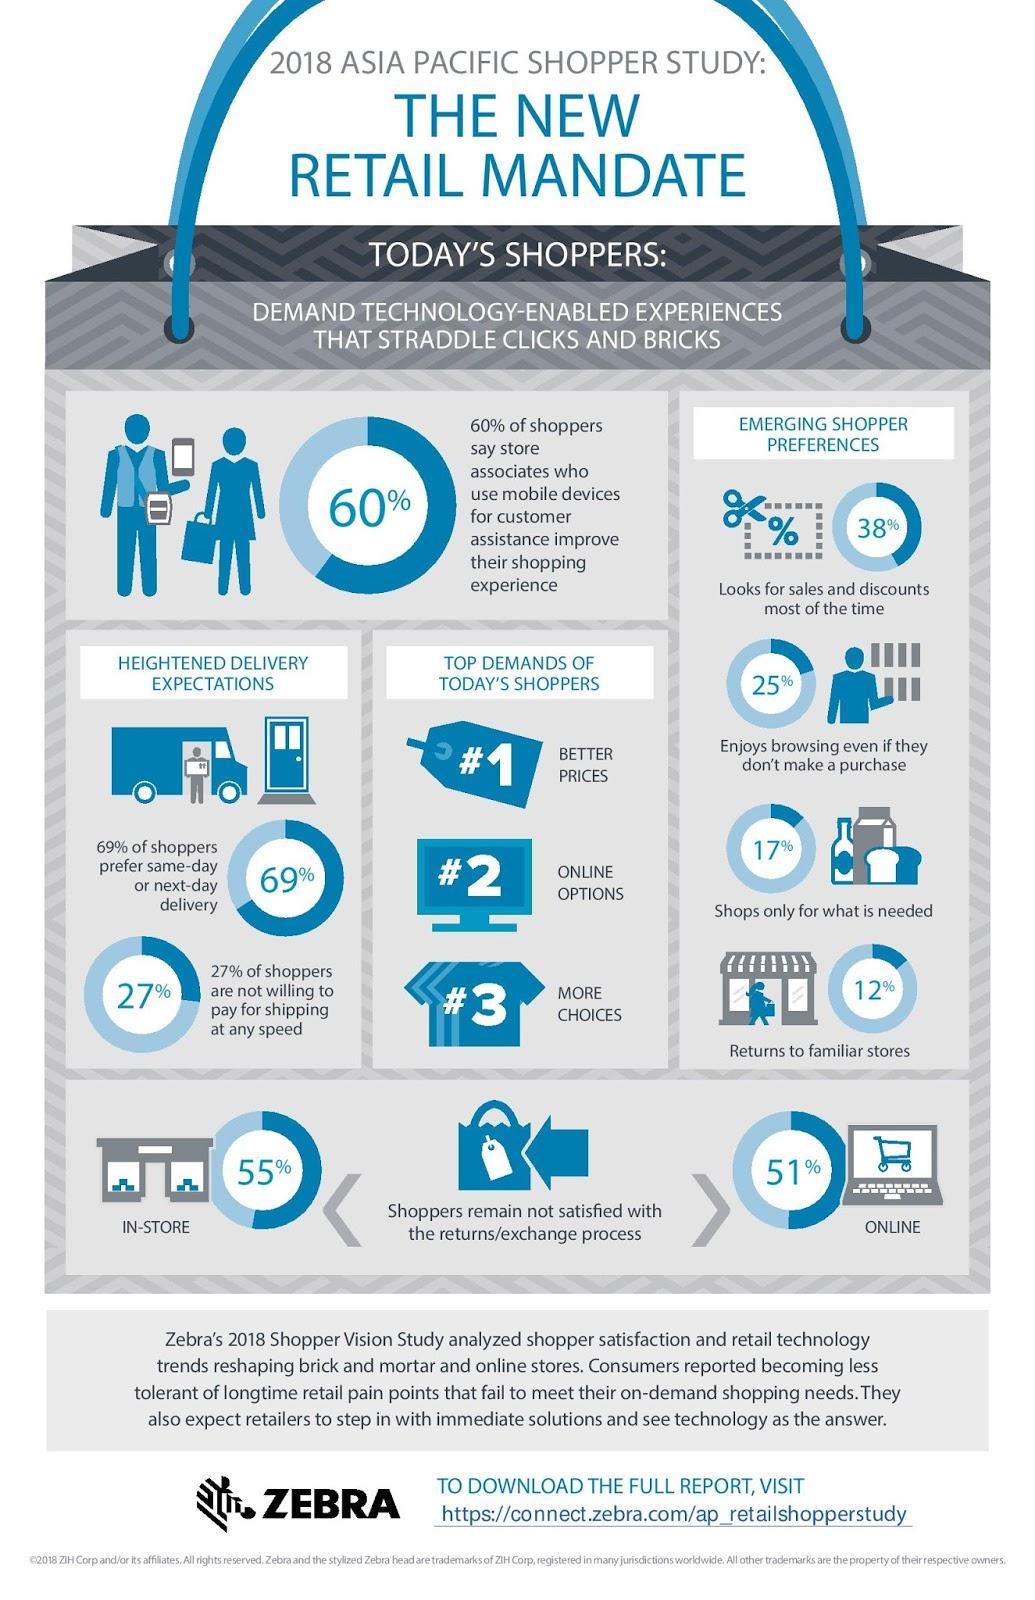 Zebra's 2018 Asia Pacific Retail Shopper Study: Infographics